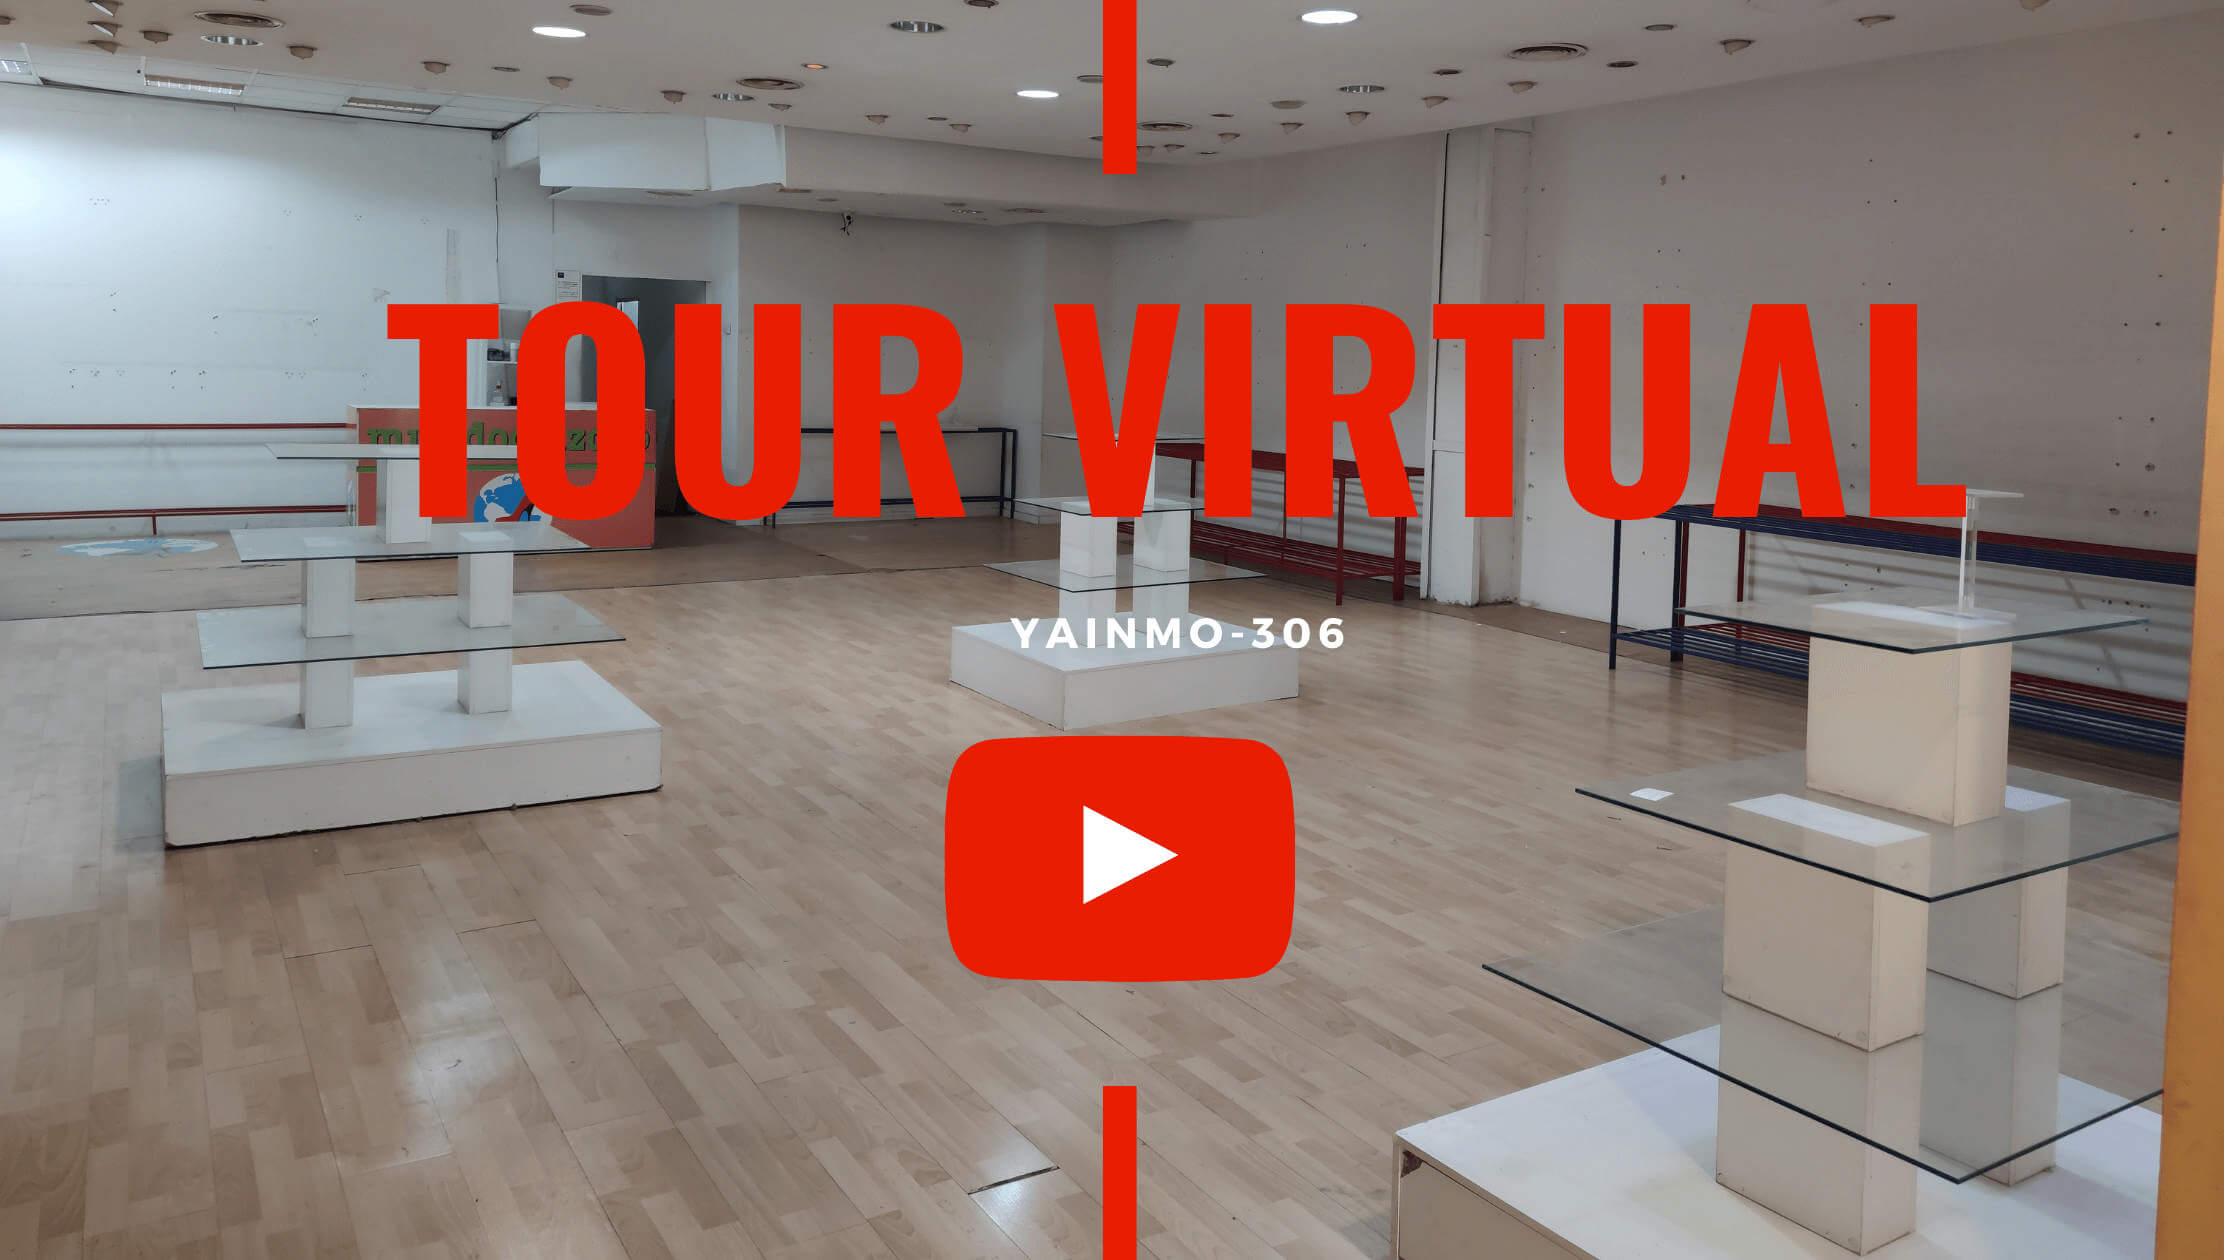 tour virtual 360 yainmo306